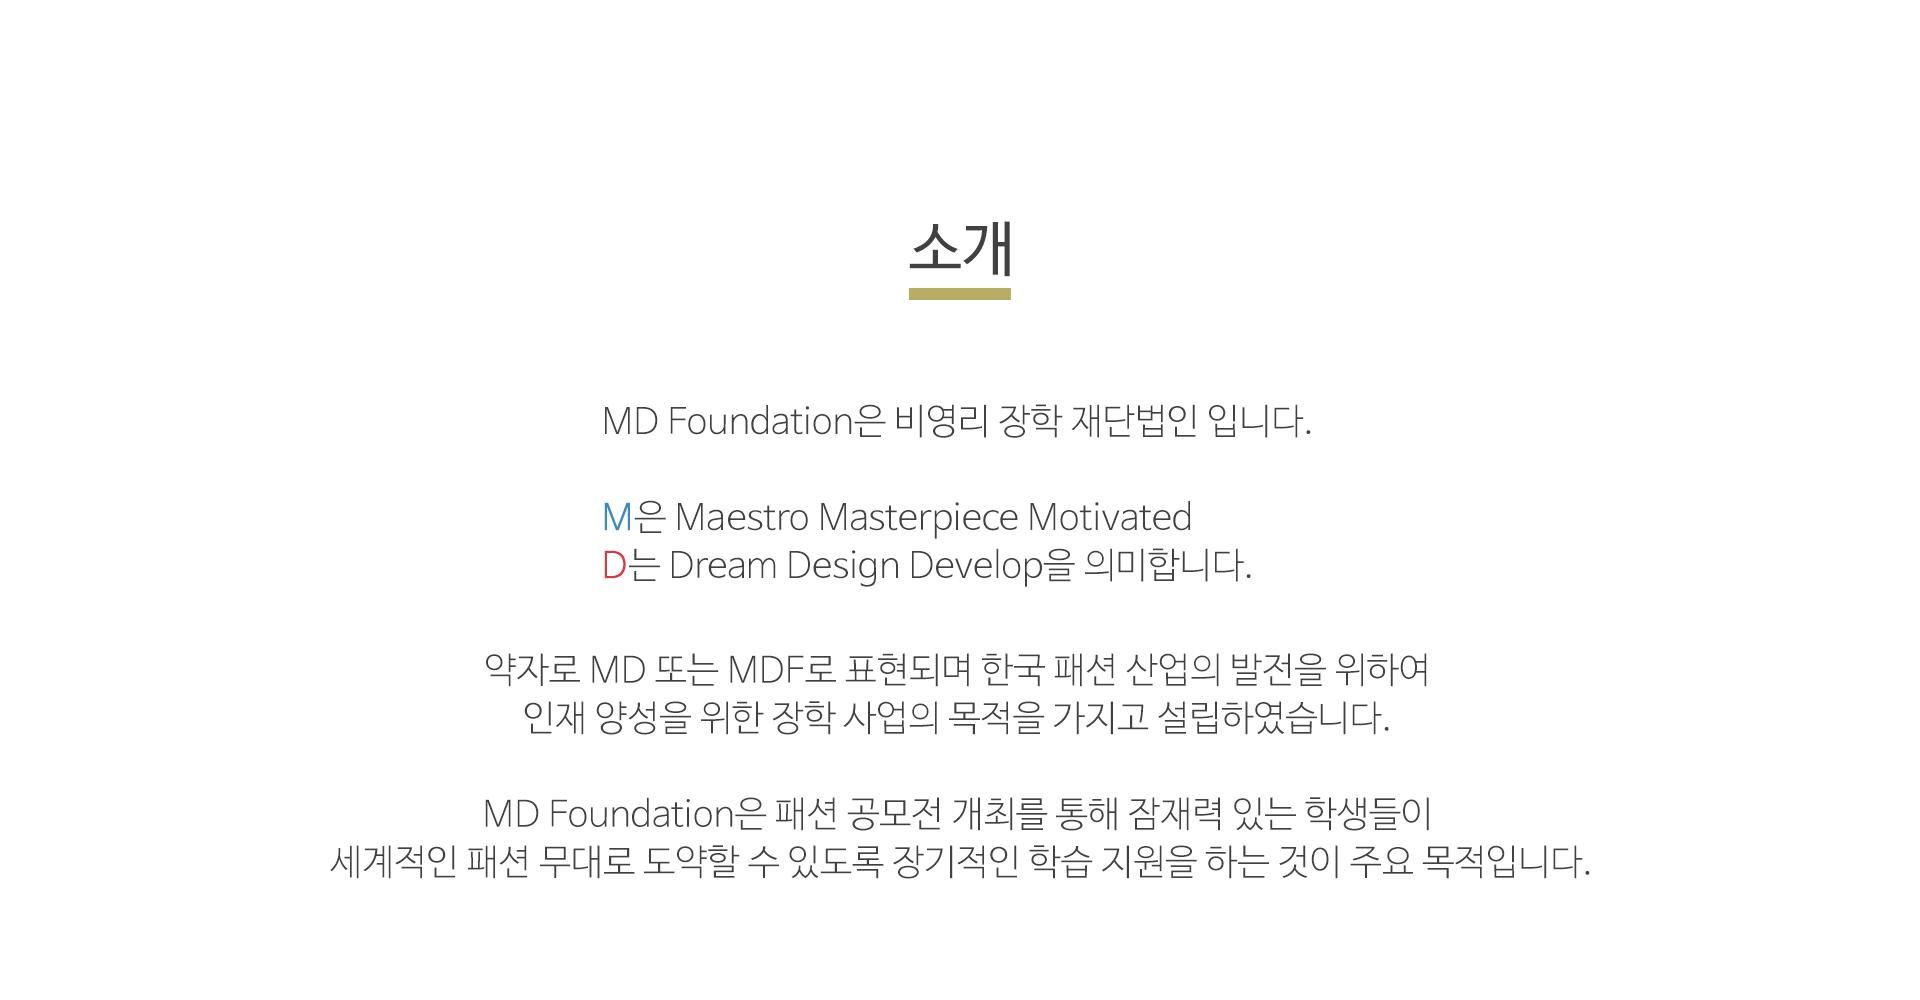 MD Foundation은 비영리 장학 재단법인 입니다. M은 Maestro Masterpiece Motivated D는 Dream Design Develop을 의미 합니다. 약자로 MD또는 MDF로 표현되며 한국 패션 산업의 발전을 위하여 인재 양성을 위한 장학 사업의 목적을 가지고 설립하였습니다. MD Foundation은 패션 공모전 개최를 통해 잠재력 있는 학생들이 세계적인 패션 무대로 도약할 수 있도록 장기적인 학습 지원을 하는 것이 주요 목적입니다.